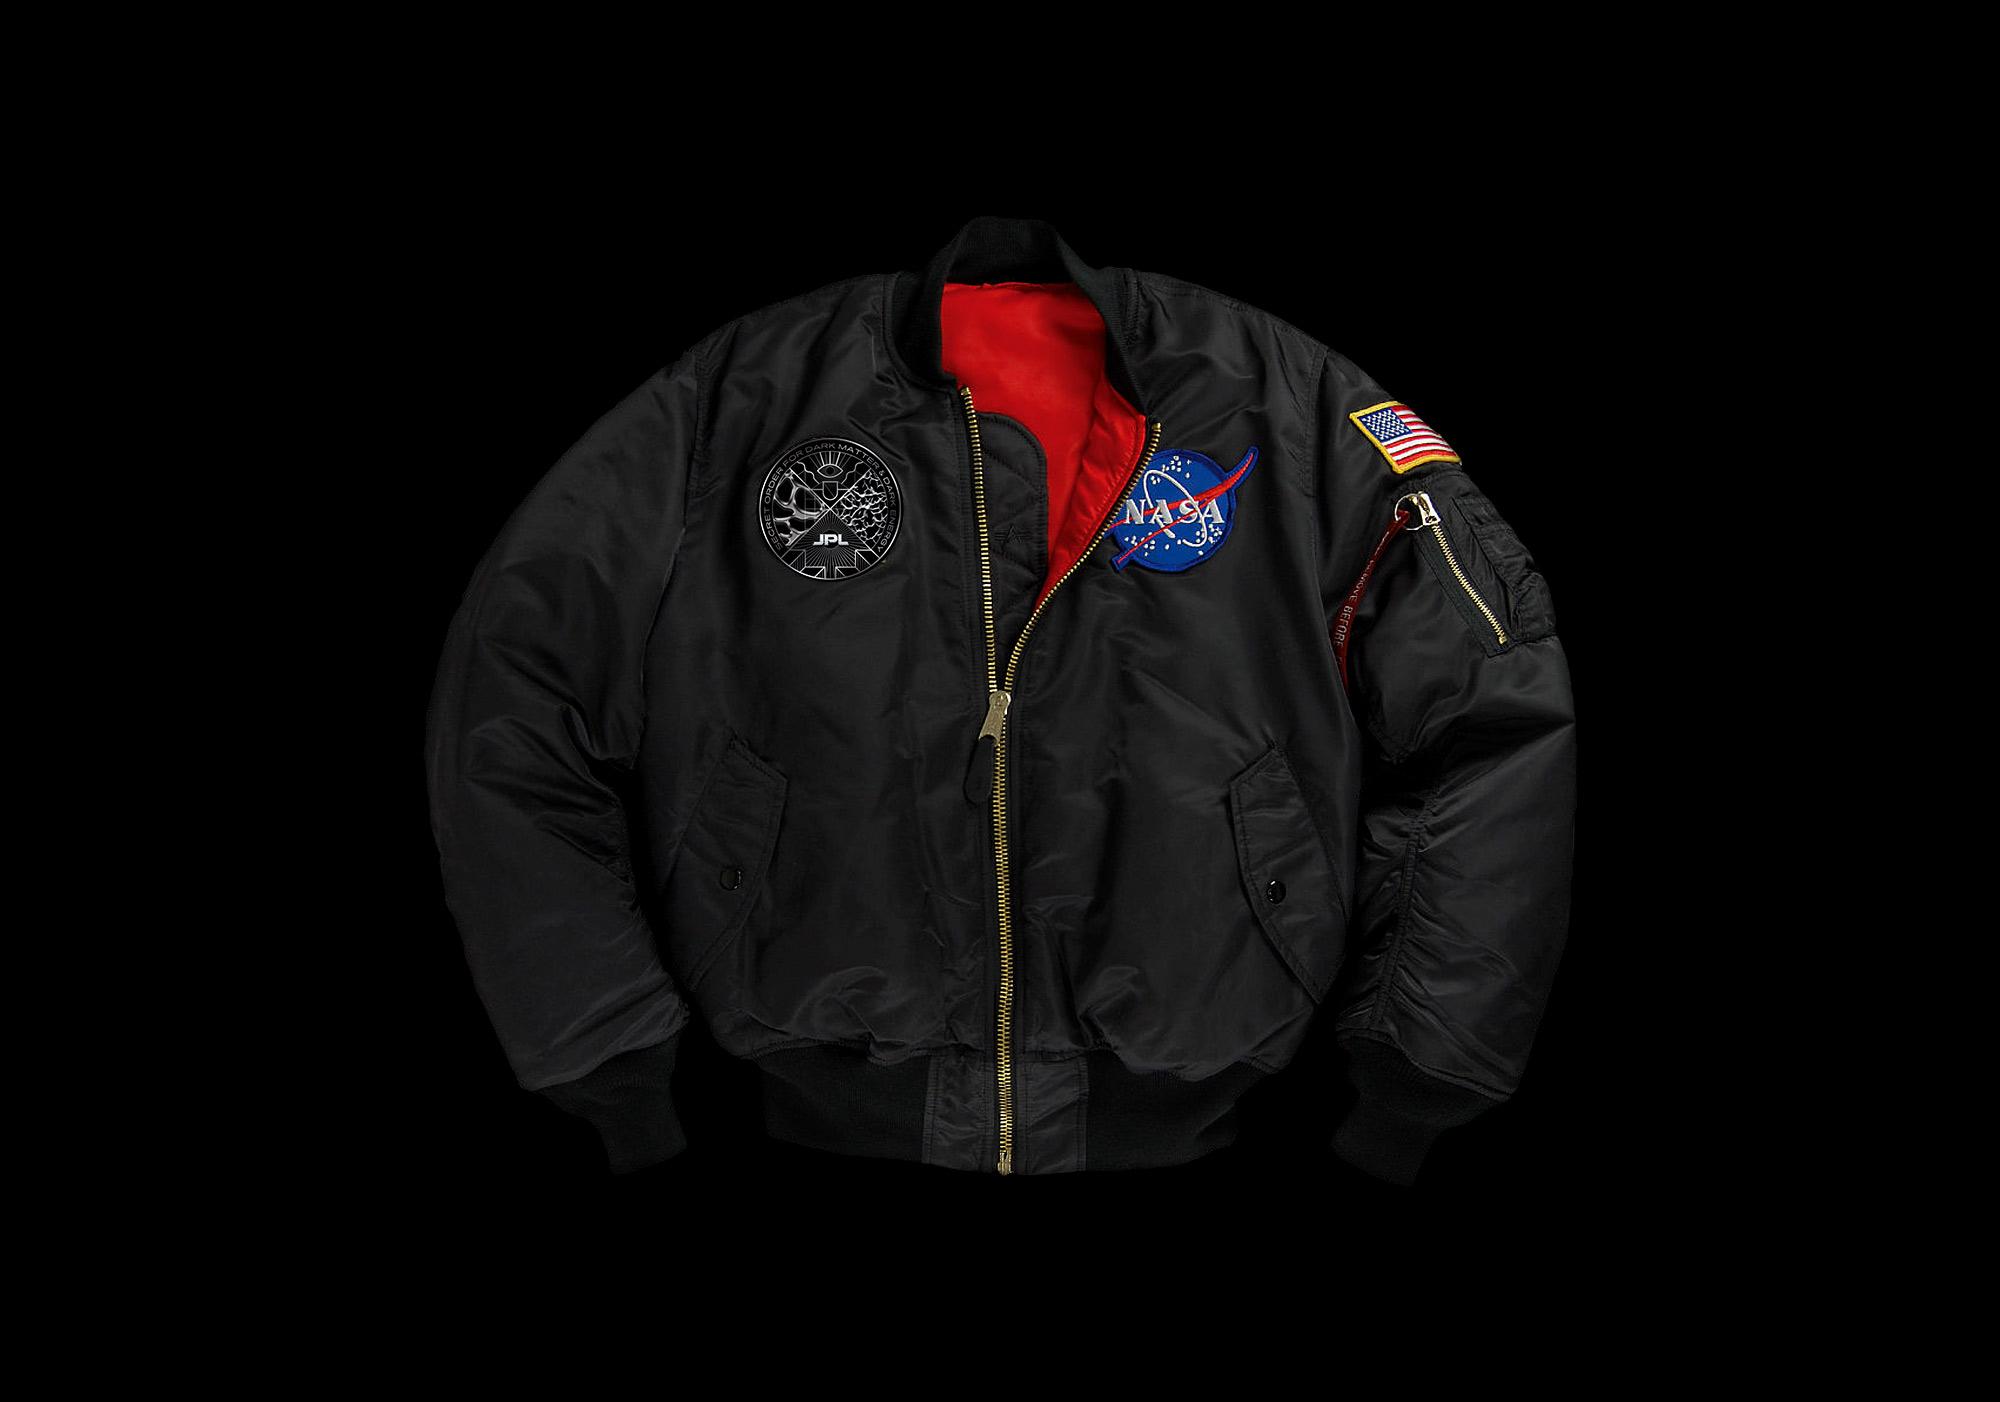 JPL_2